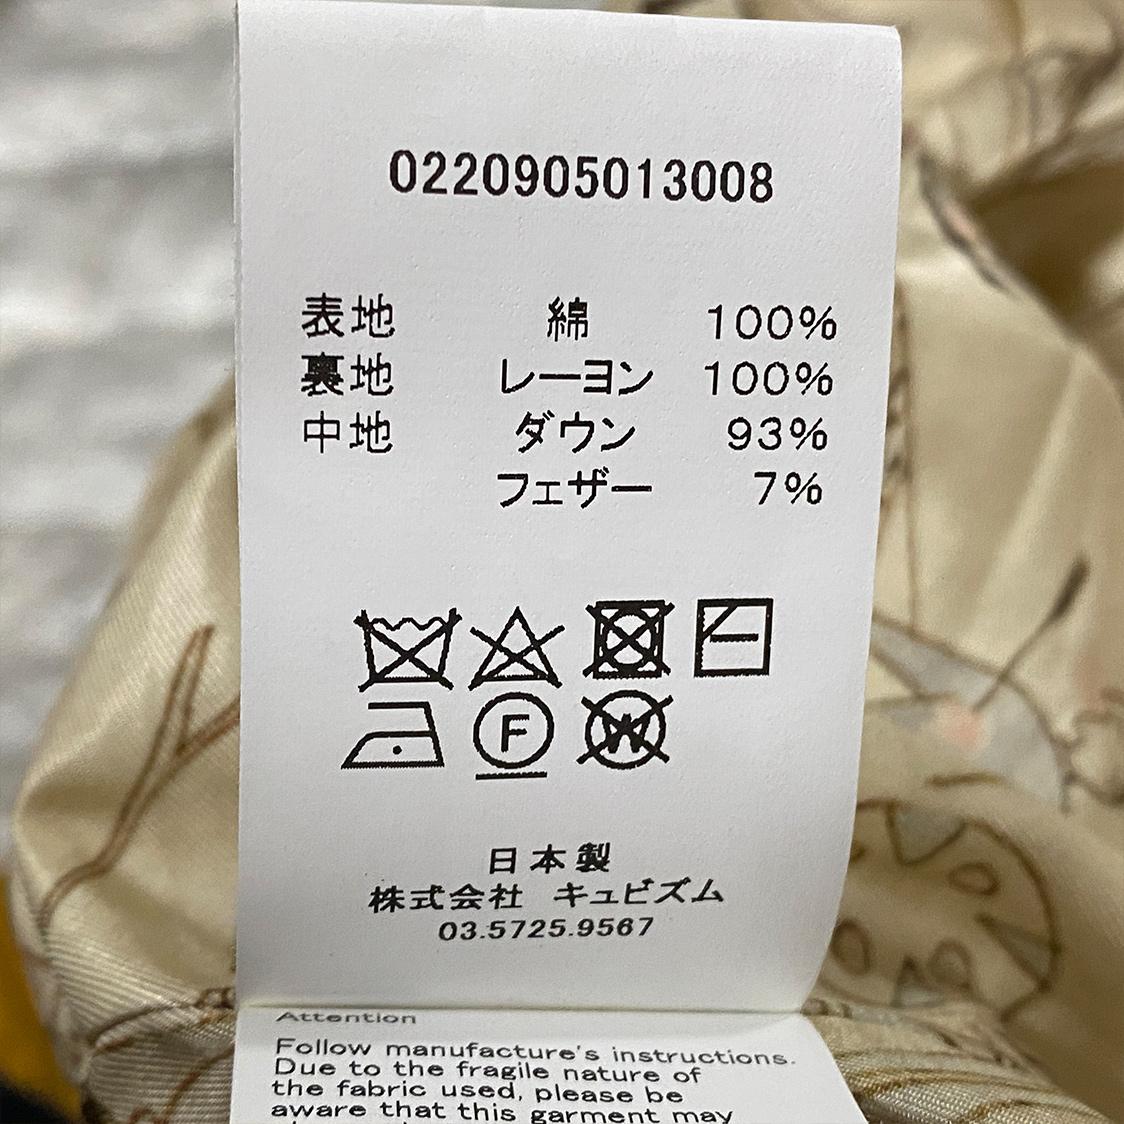 VISVIM ビズビム 【サイズ3】 ペイズリー柄 ダウンジャケット イエロー